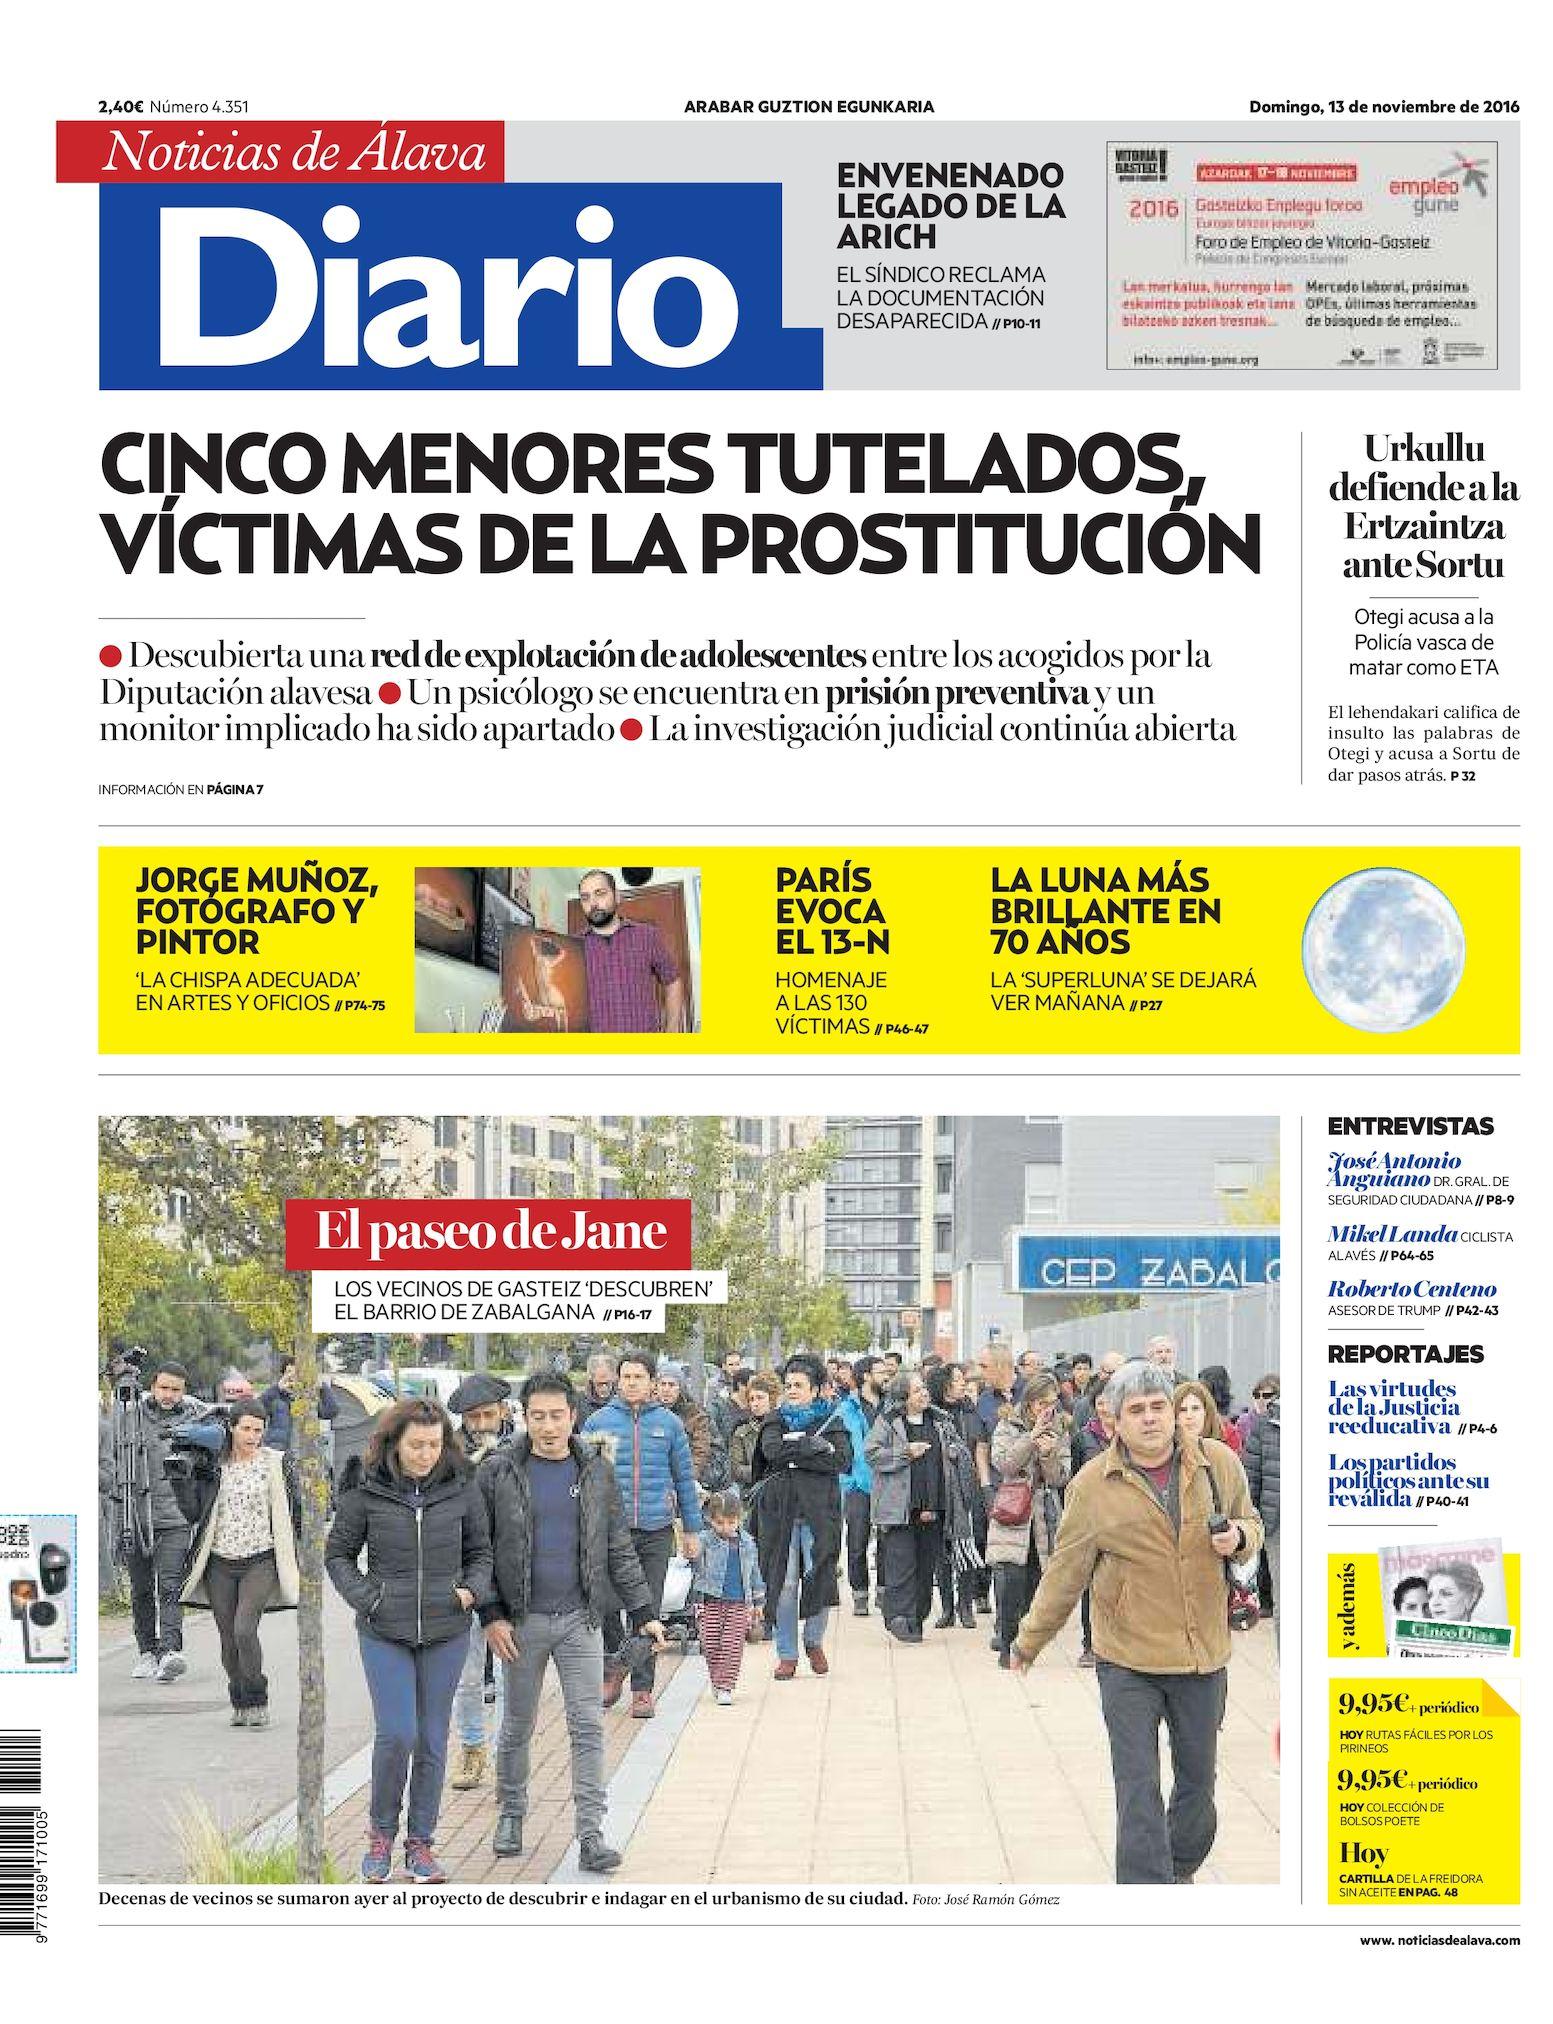 5ee3515ae7f19 Calaméo - Diario de Noticias de Álava 20161113